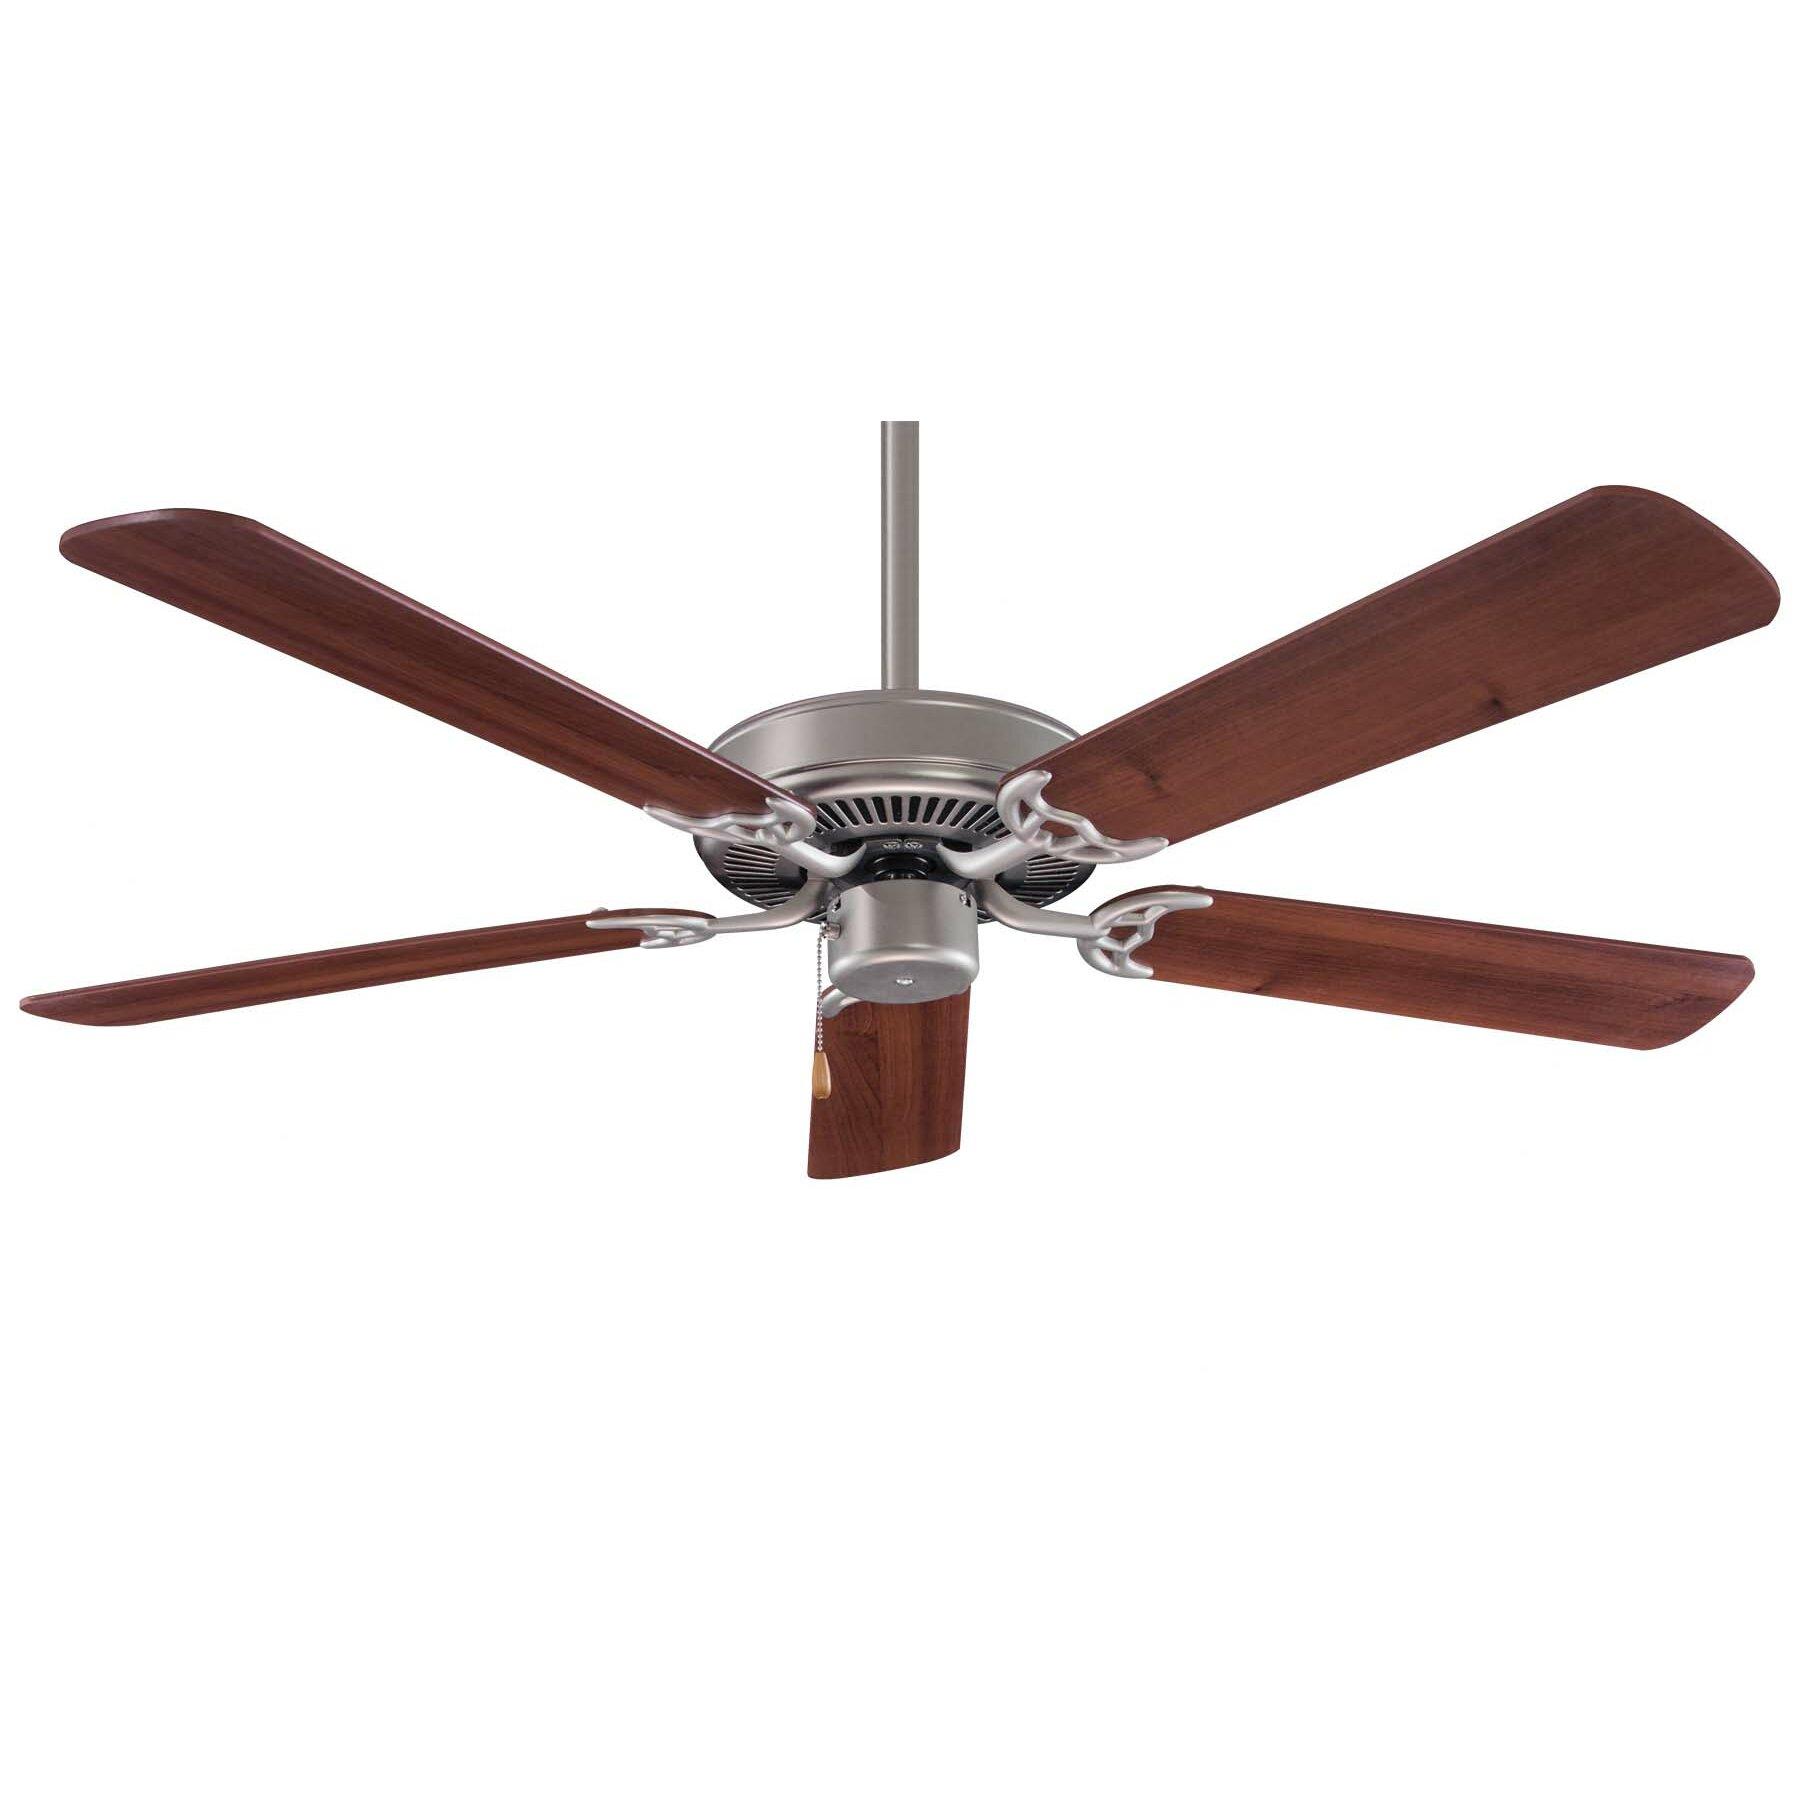 "Ceiling Fan Minka Aire: Minka Aire 42"" Contractor 5 Blade Ceiling Fan & Reviews"